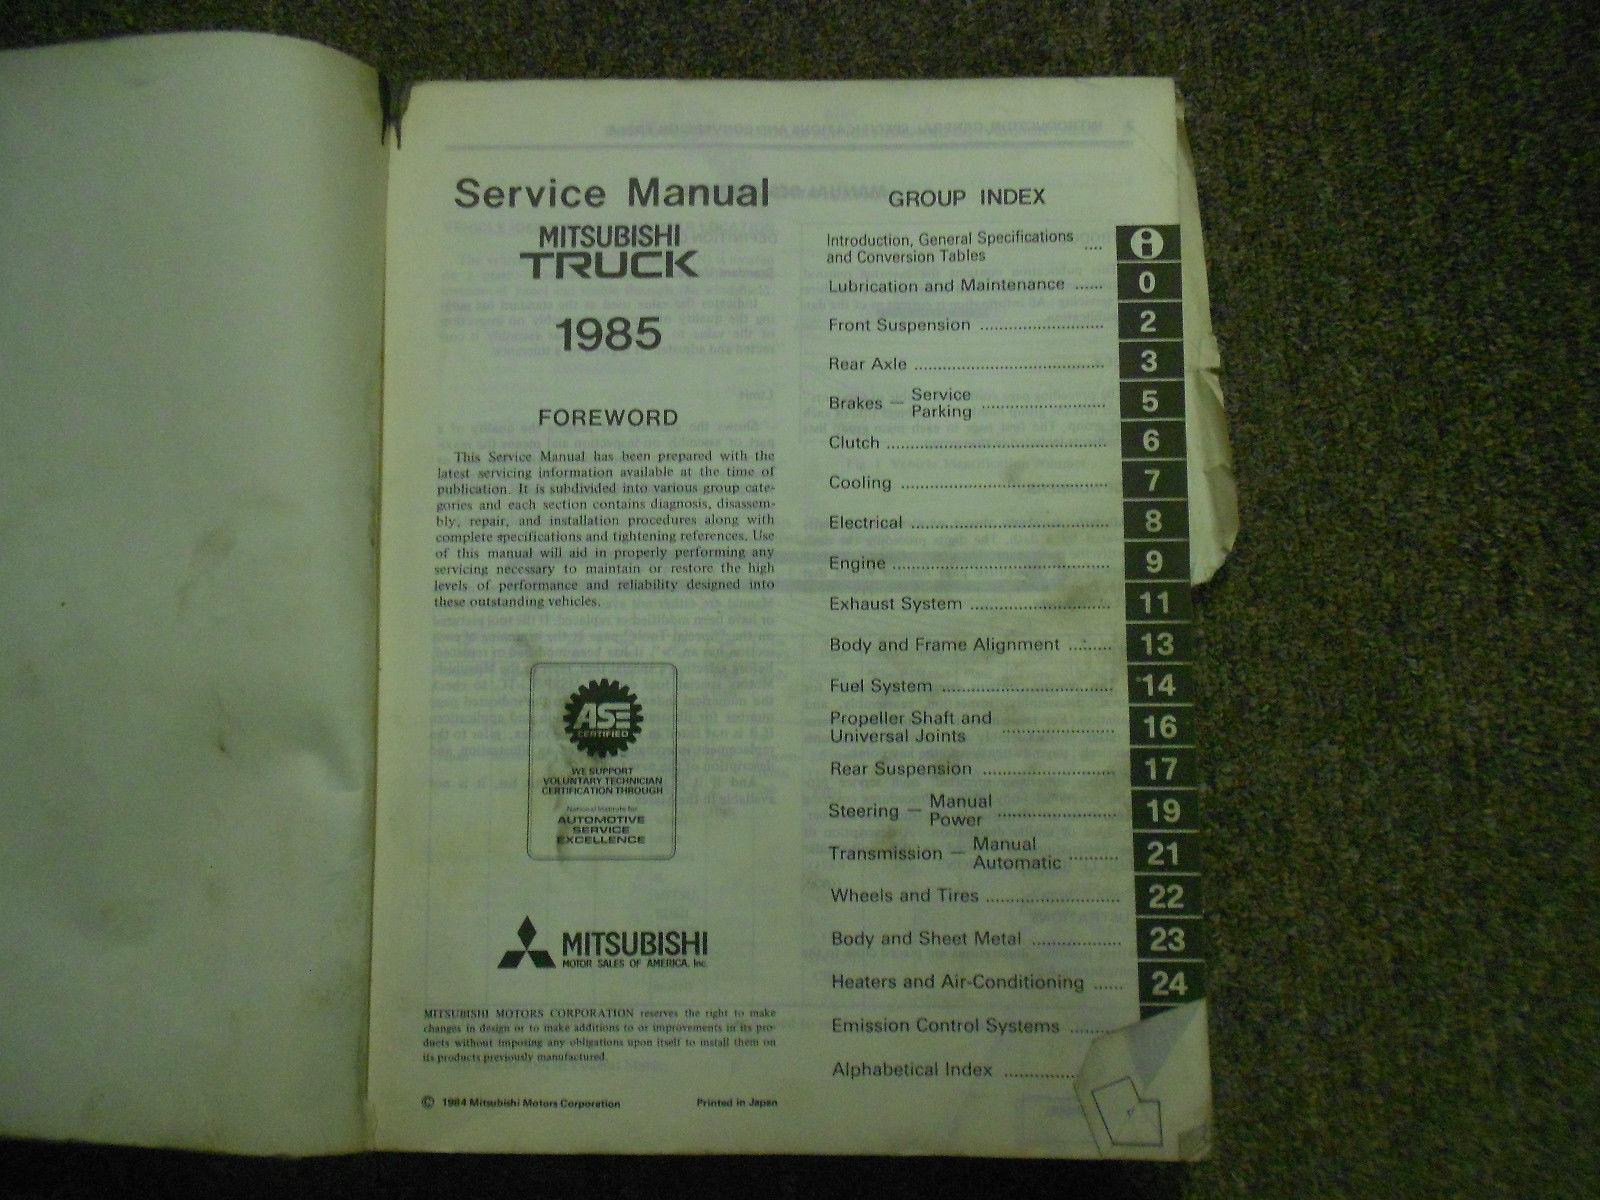 1985 MITSUBISHI Truck Service Repair Shop Manual OEM BOOK 85 FACTORY DAMAGED